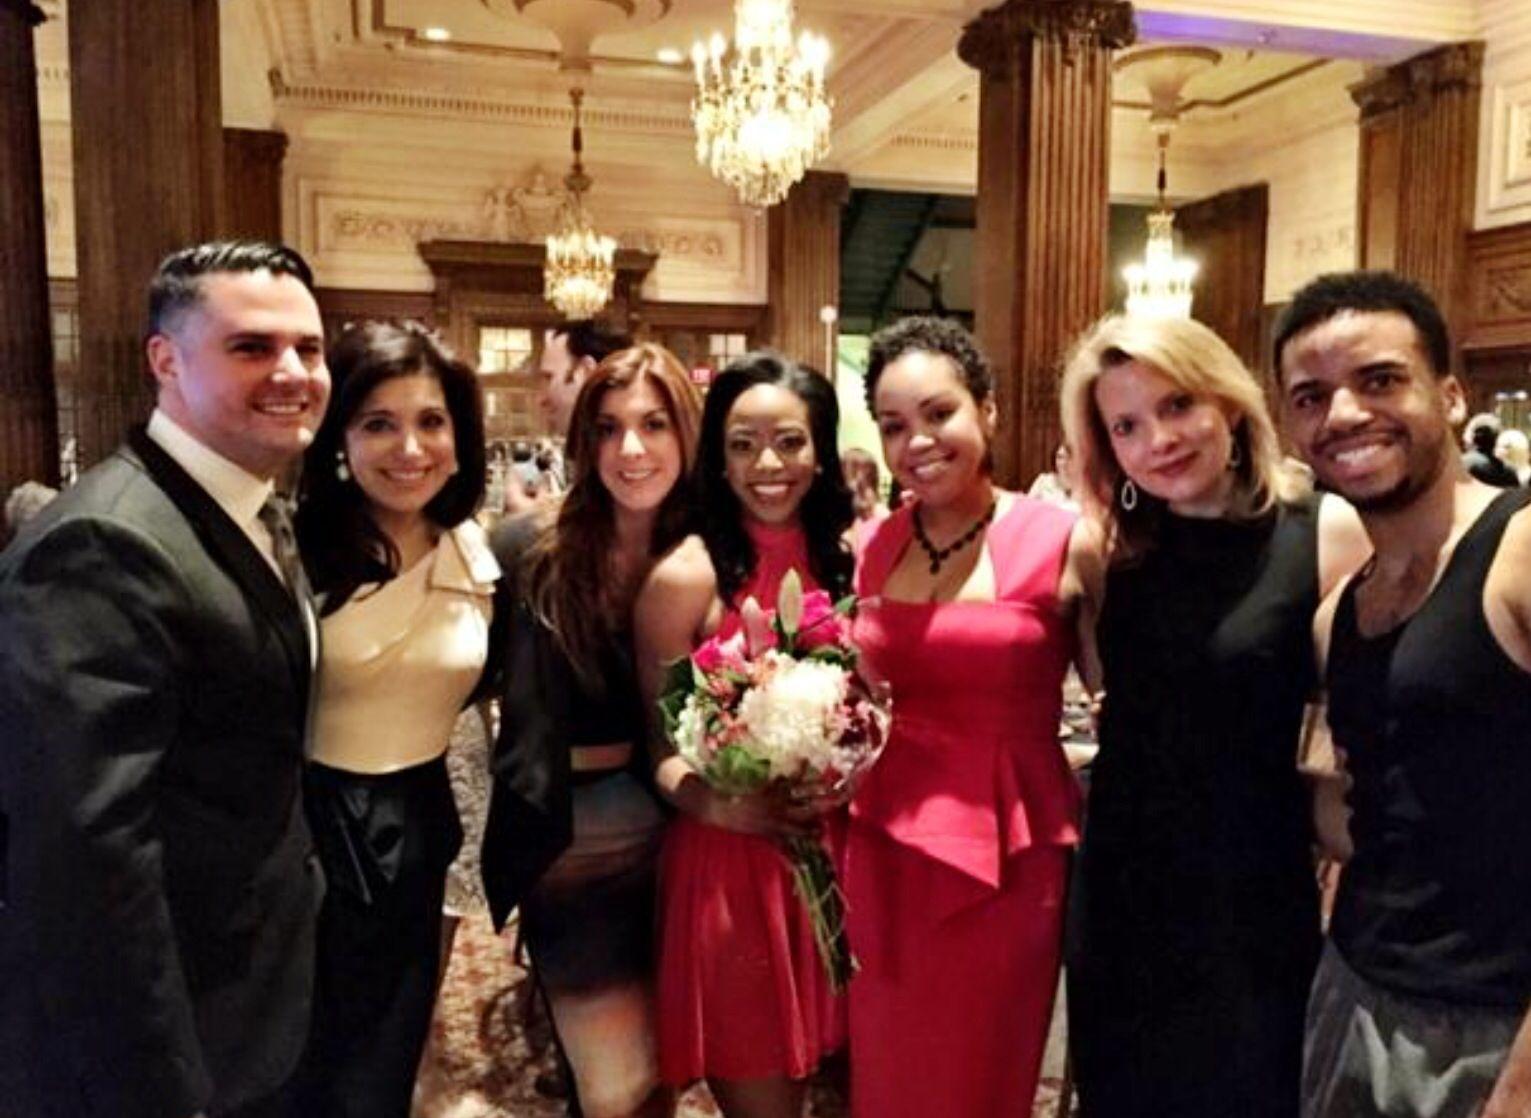 Melissa Magee Roger Lee Dance For Charity Www Rogerleedance Com Bridesmaid Dresses Wedding Dresses Bridesmaid